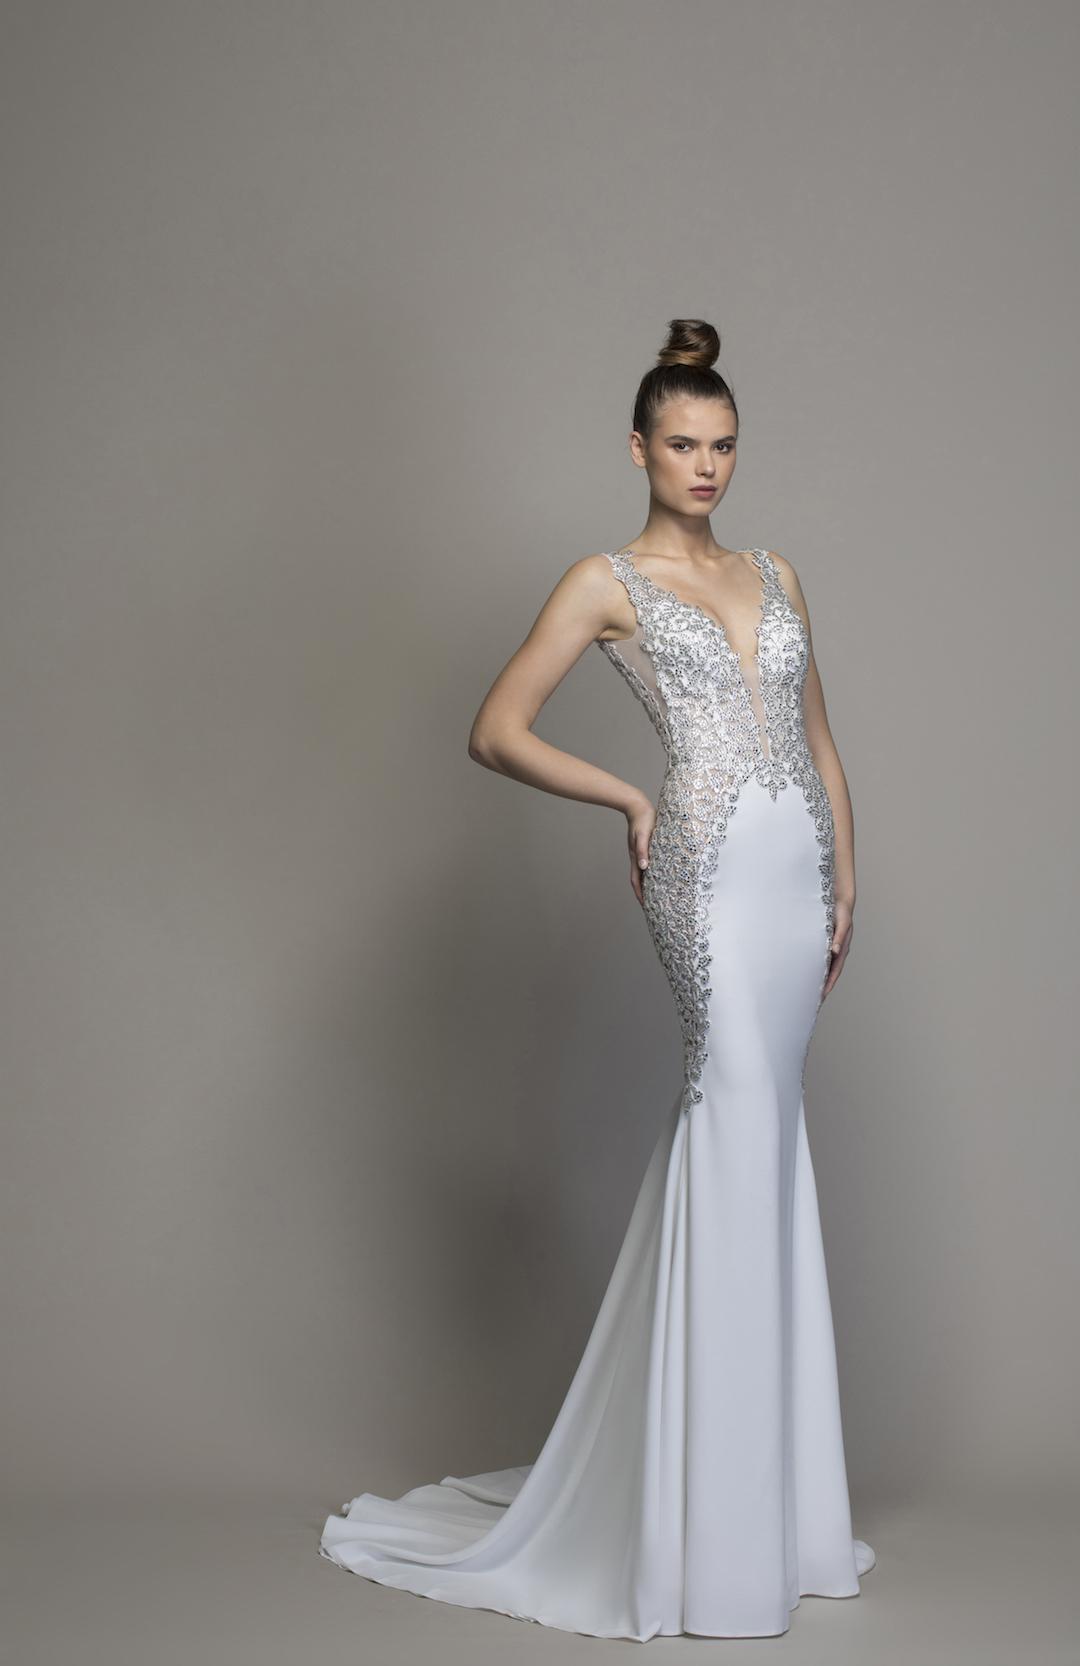 Crepe Sheath Wedding Dress With Crystal Embellishments